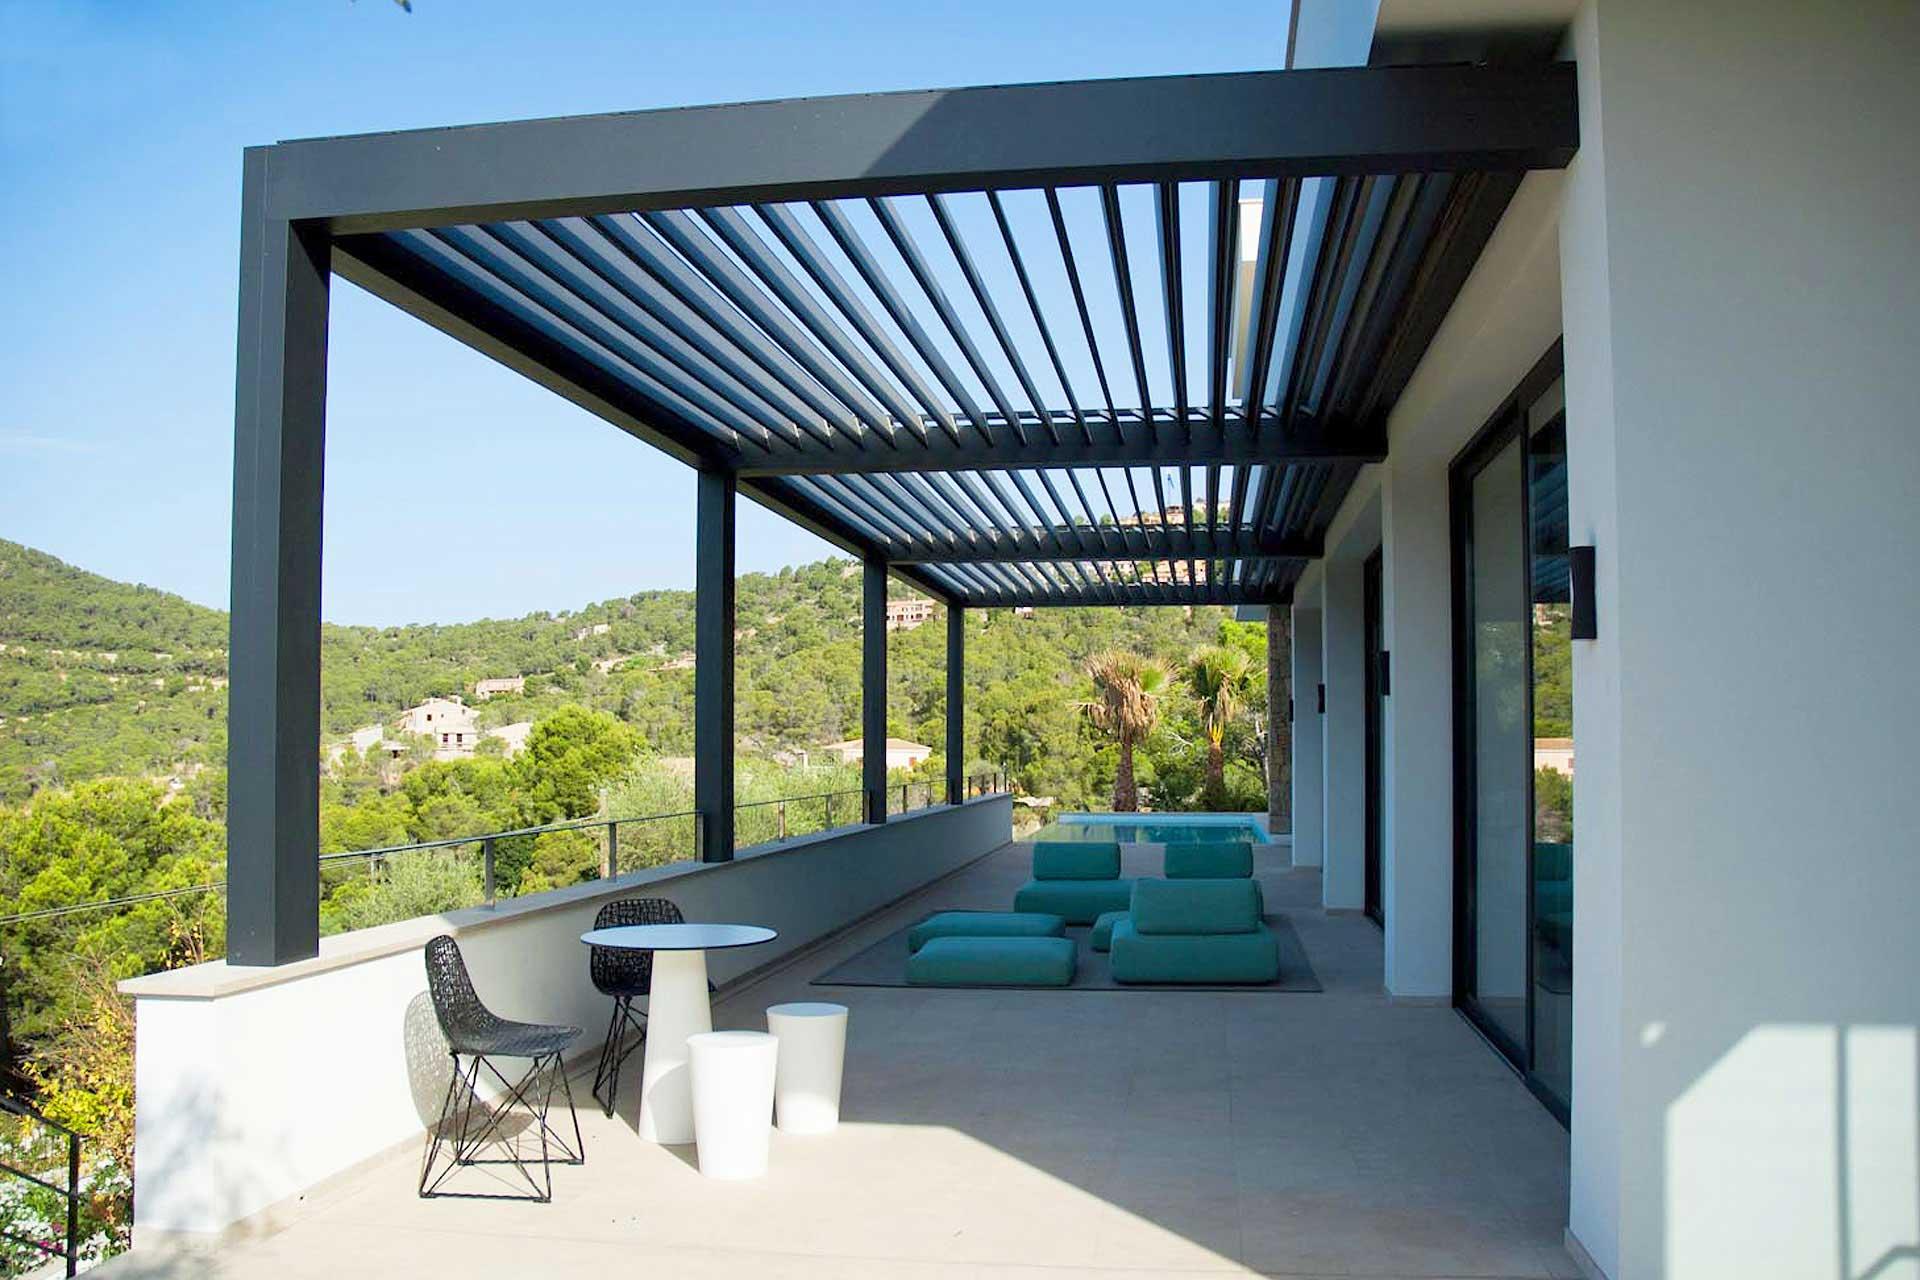 precios de toldos de terraza pergolas para terrazas precios finest pergolas con toldo